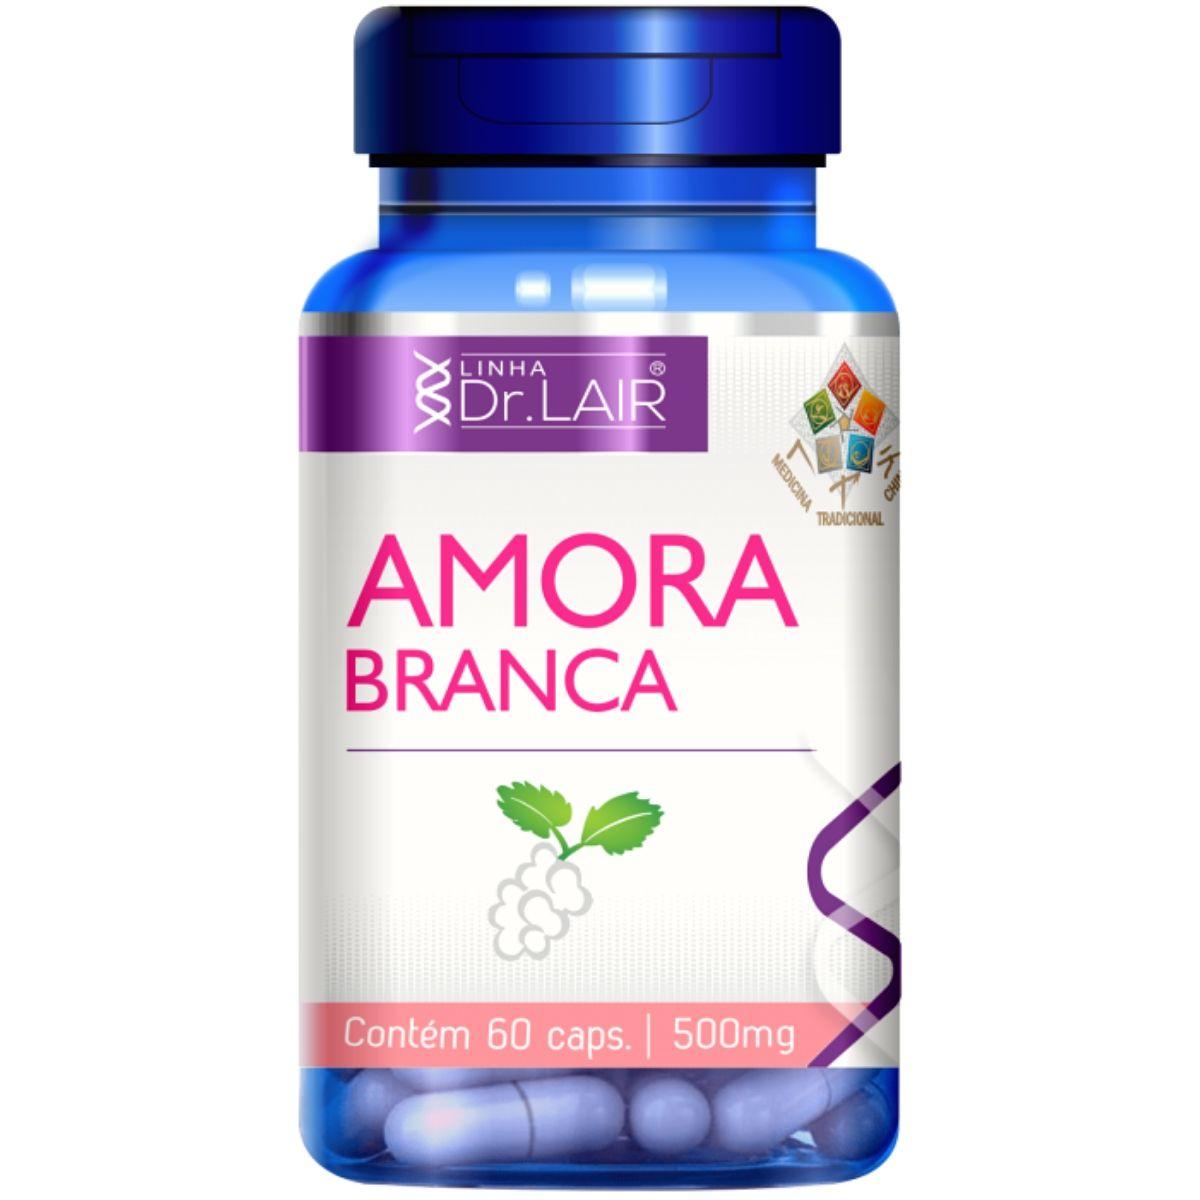 Amora Branca Vitaminas e Minerais 60 Cápsulas 500mg Dr. Lair - Upnutri